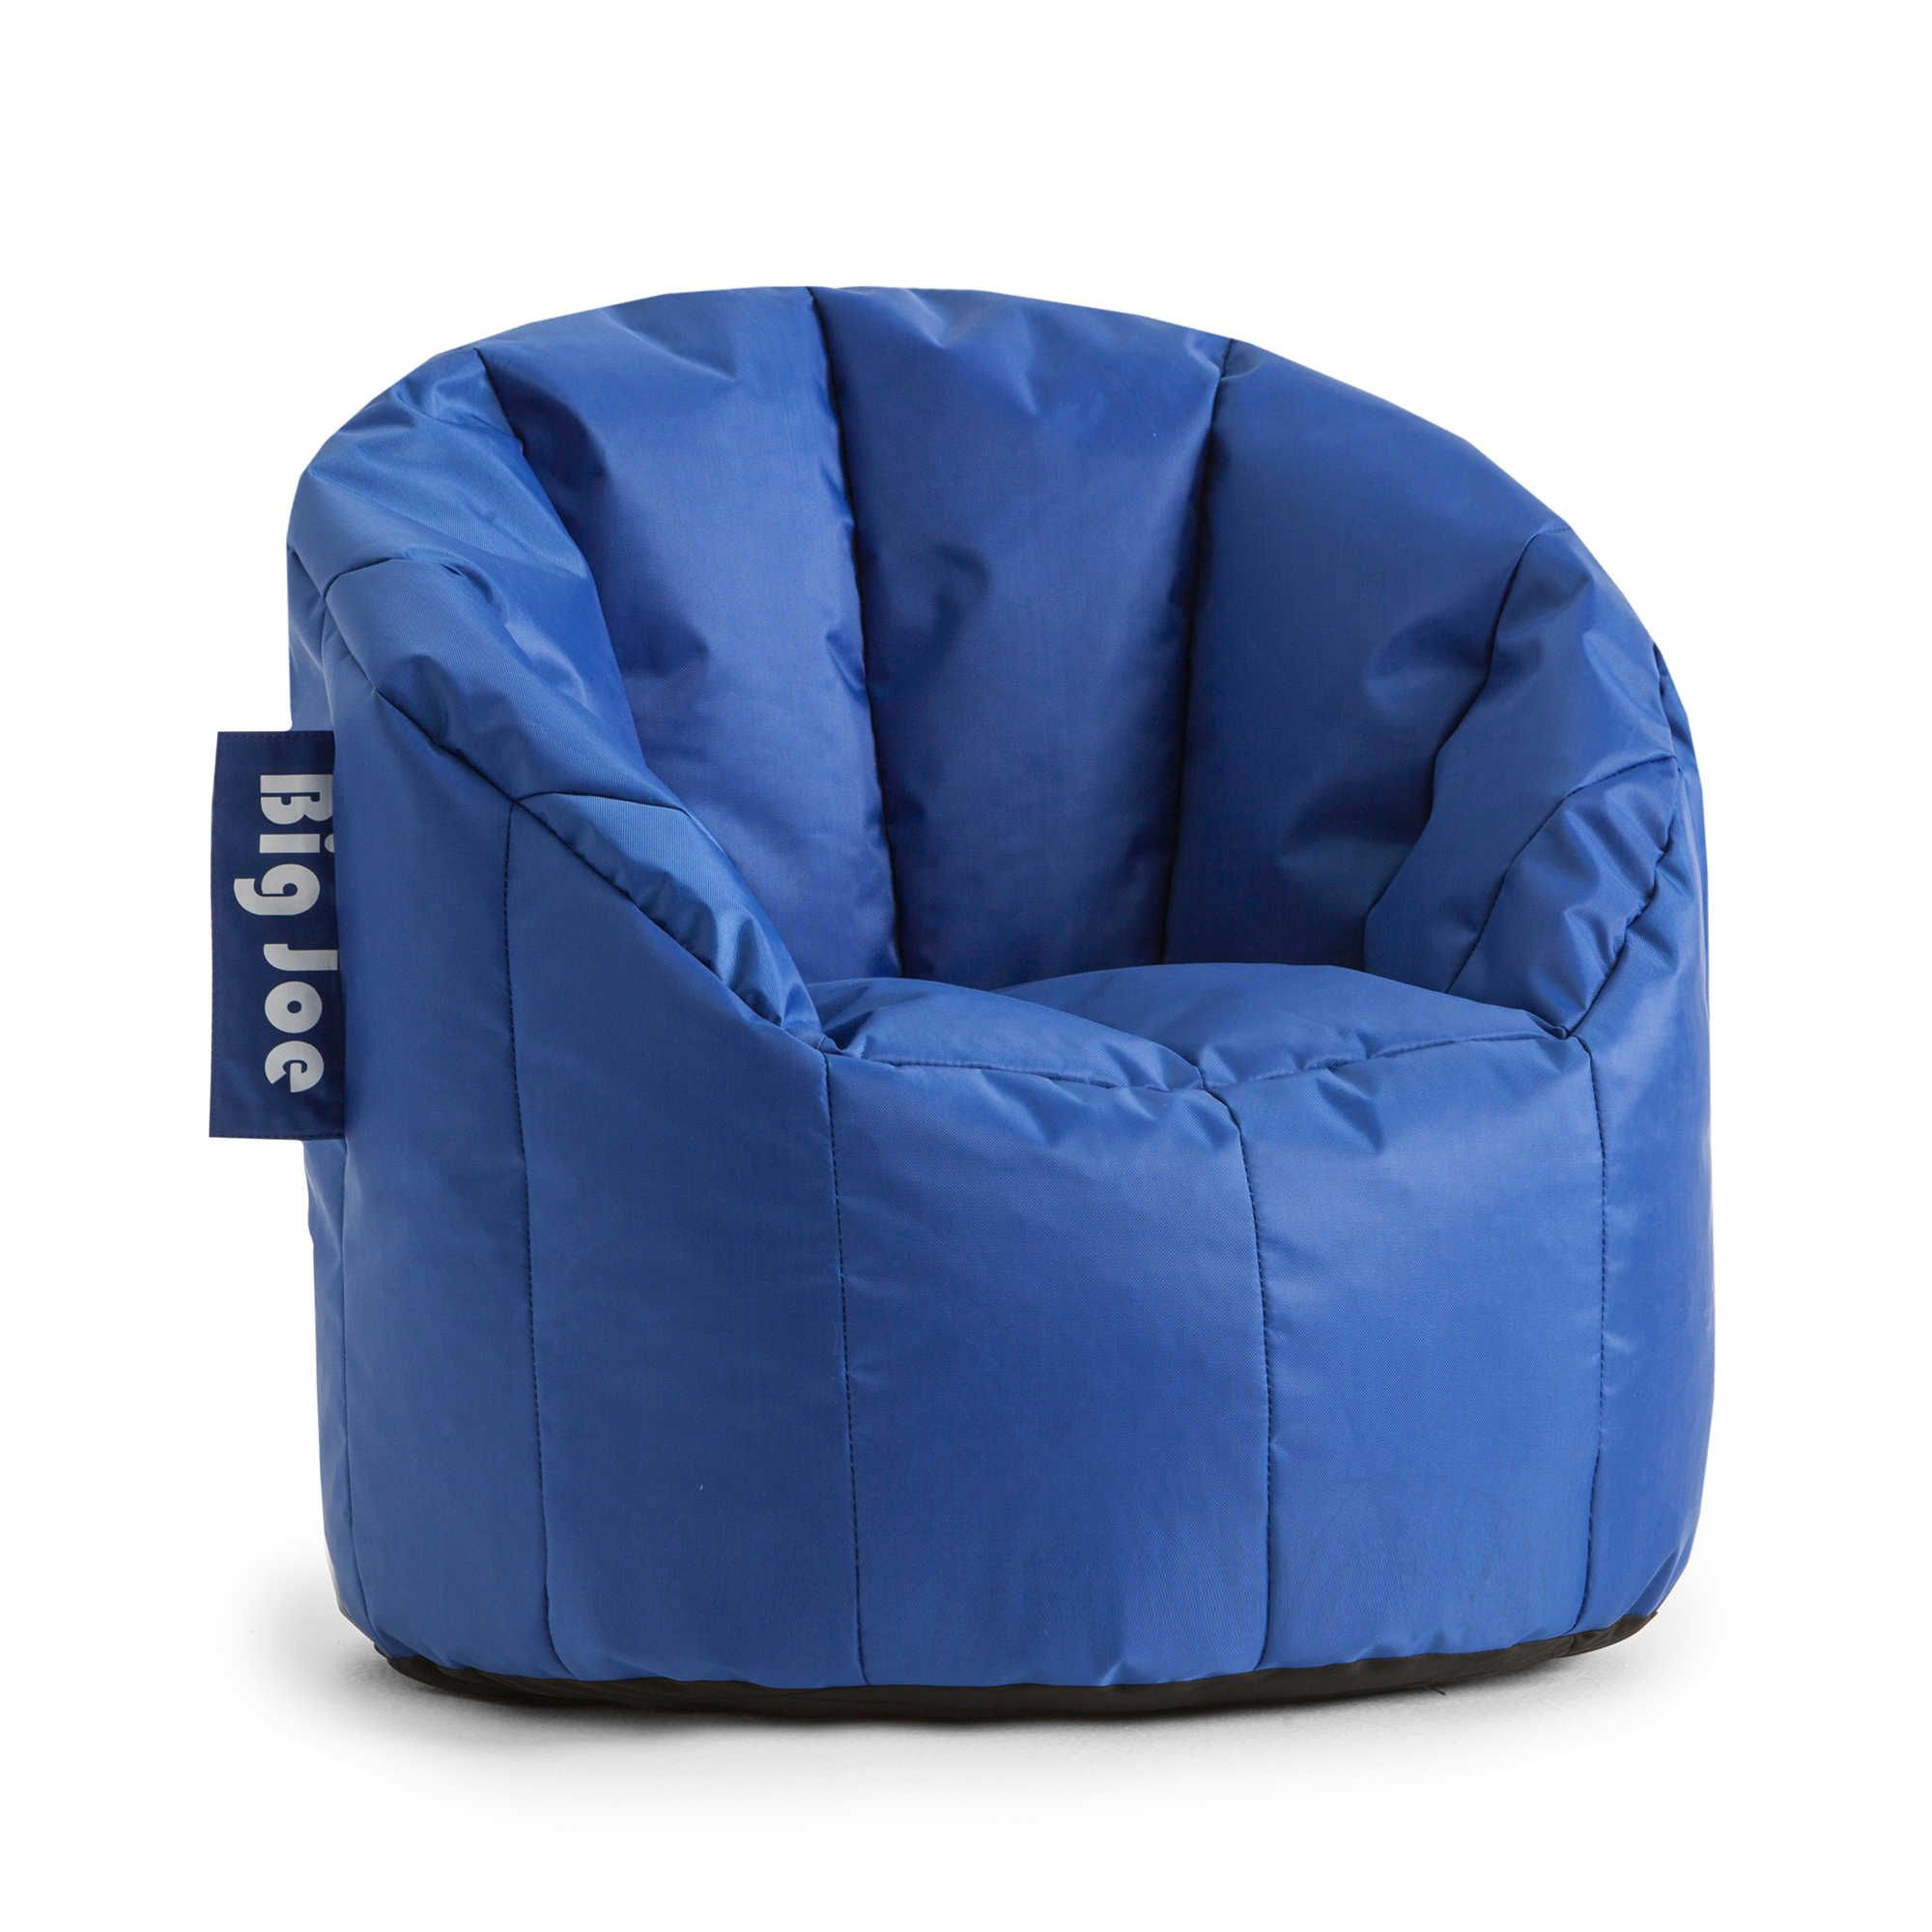 Comfort Research Big Joe Kids Lumin Chair in Sapphire